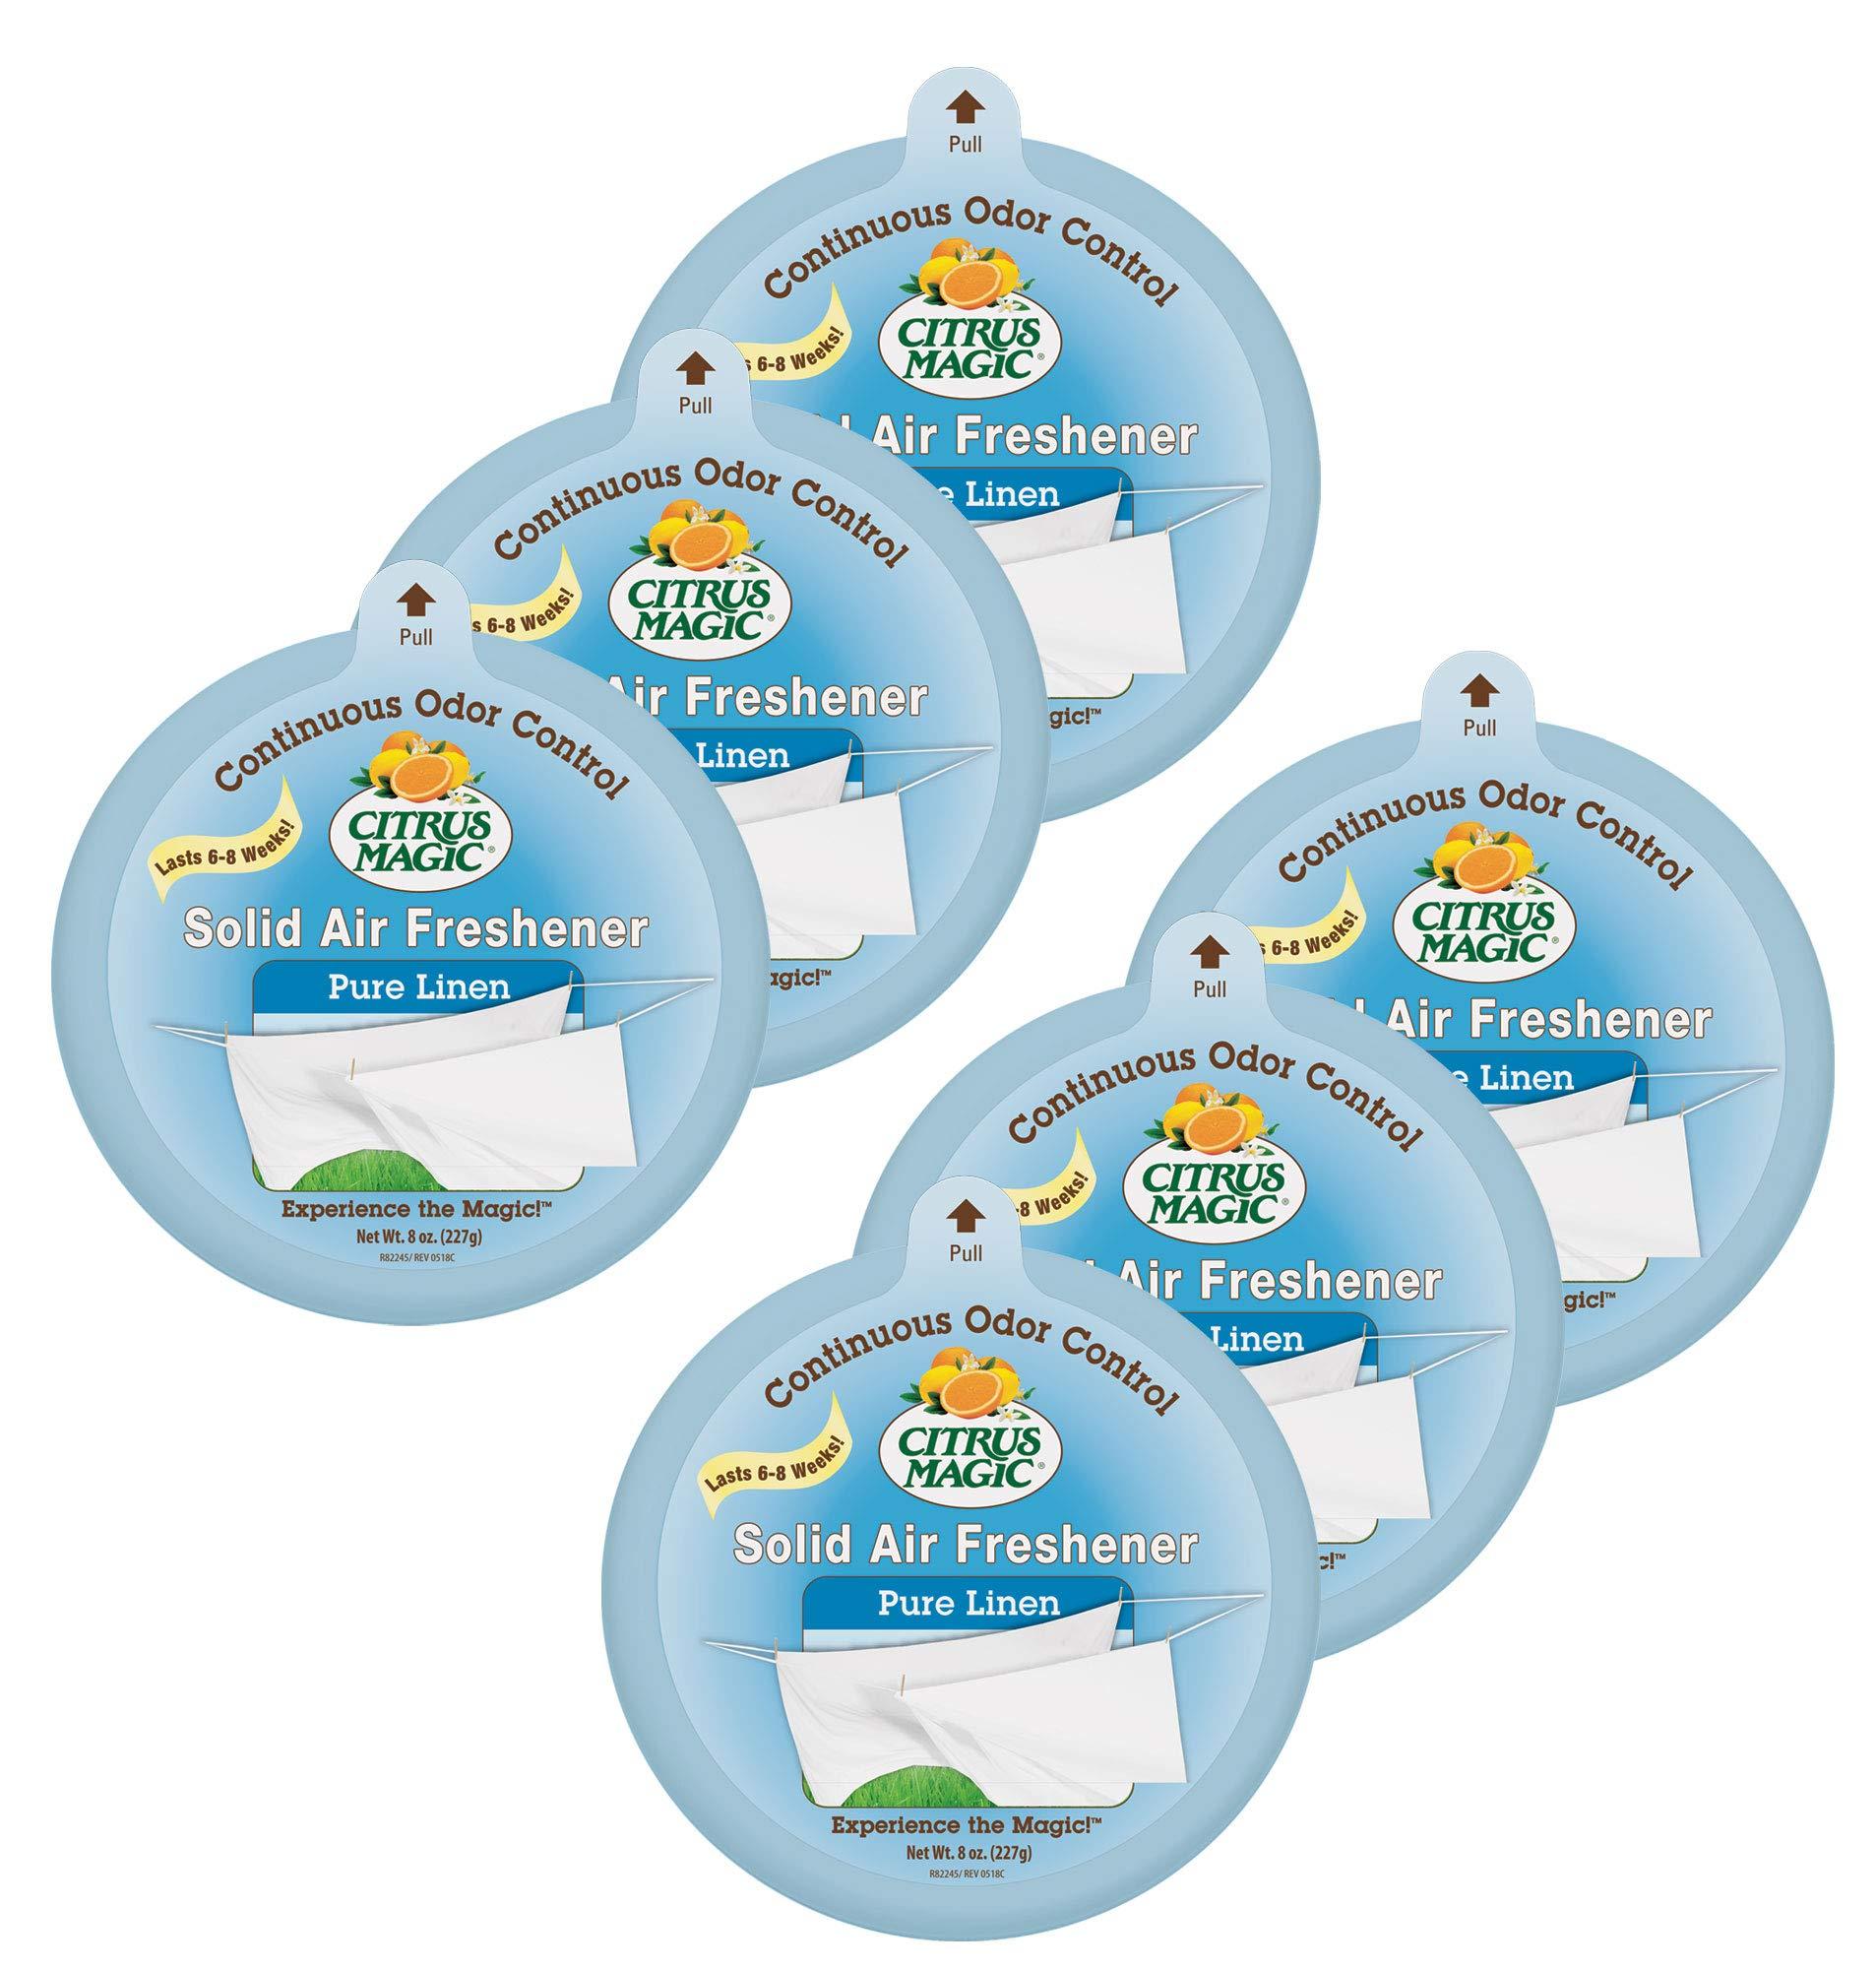 Citrus Magic Solid Air Freshener Pure Linen, Pack of 6, 8-Ounces by Citrus Magic